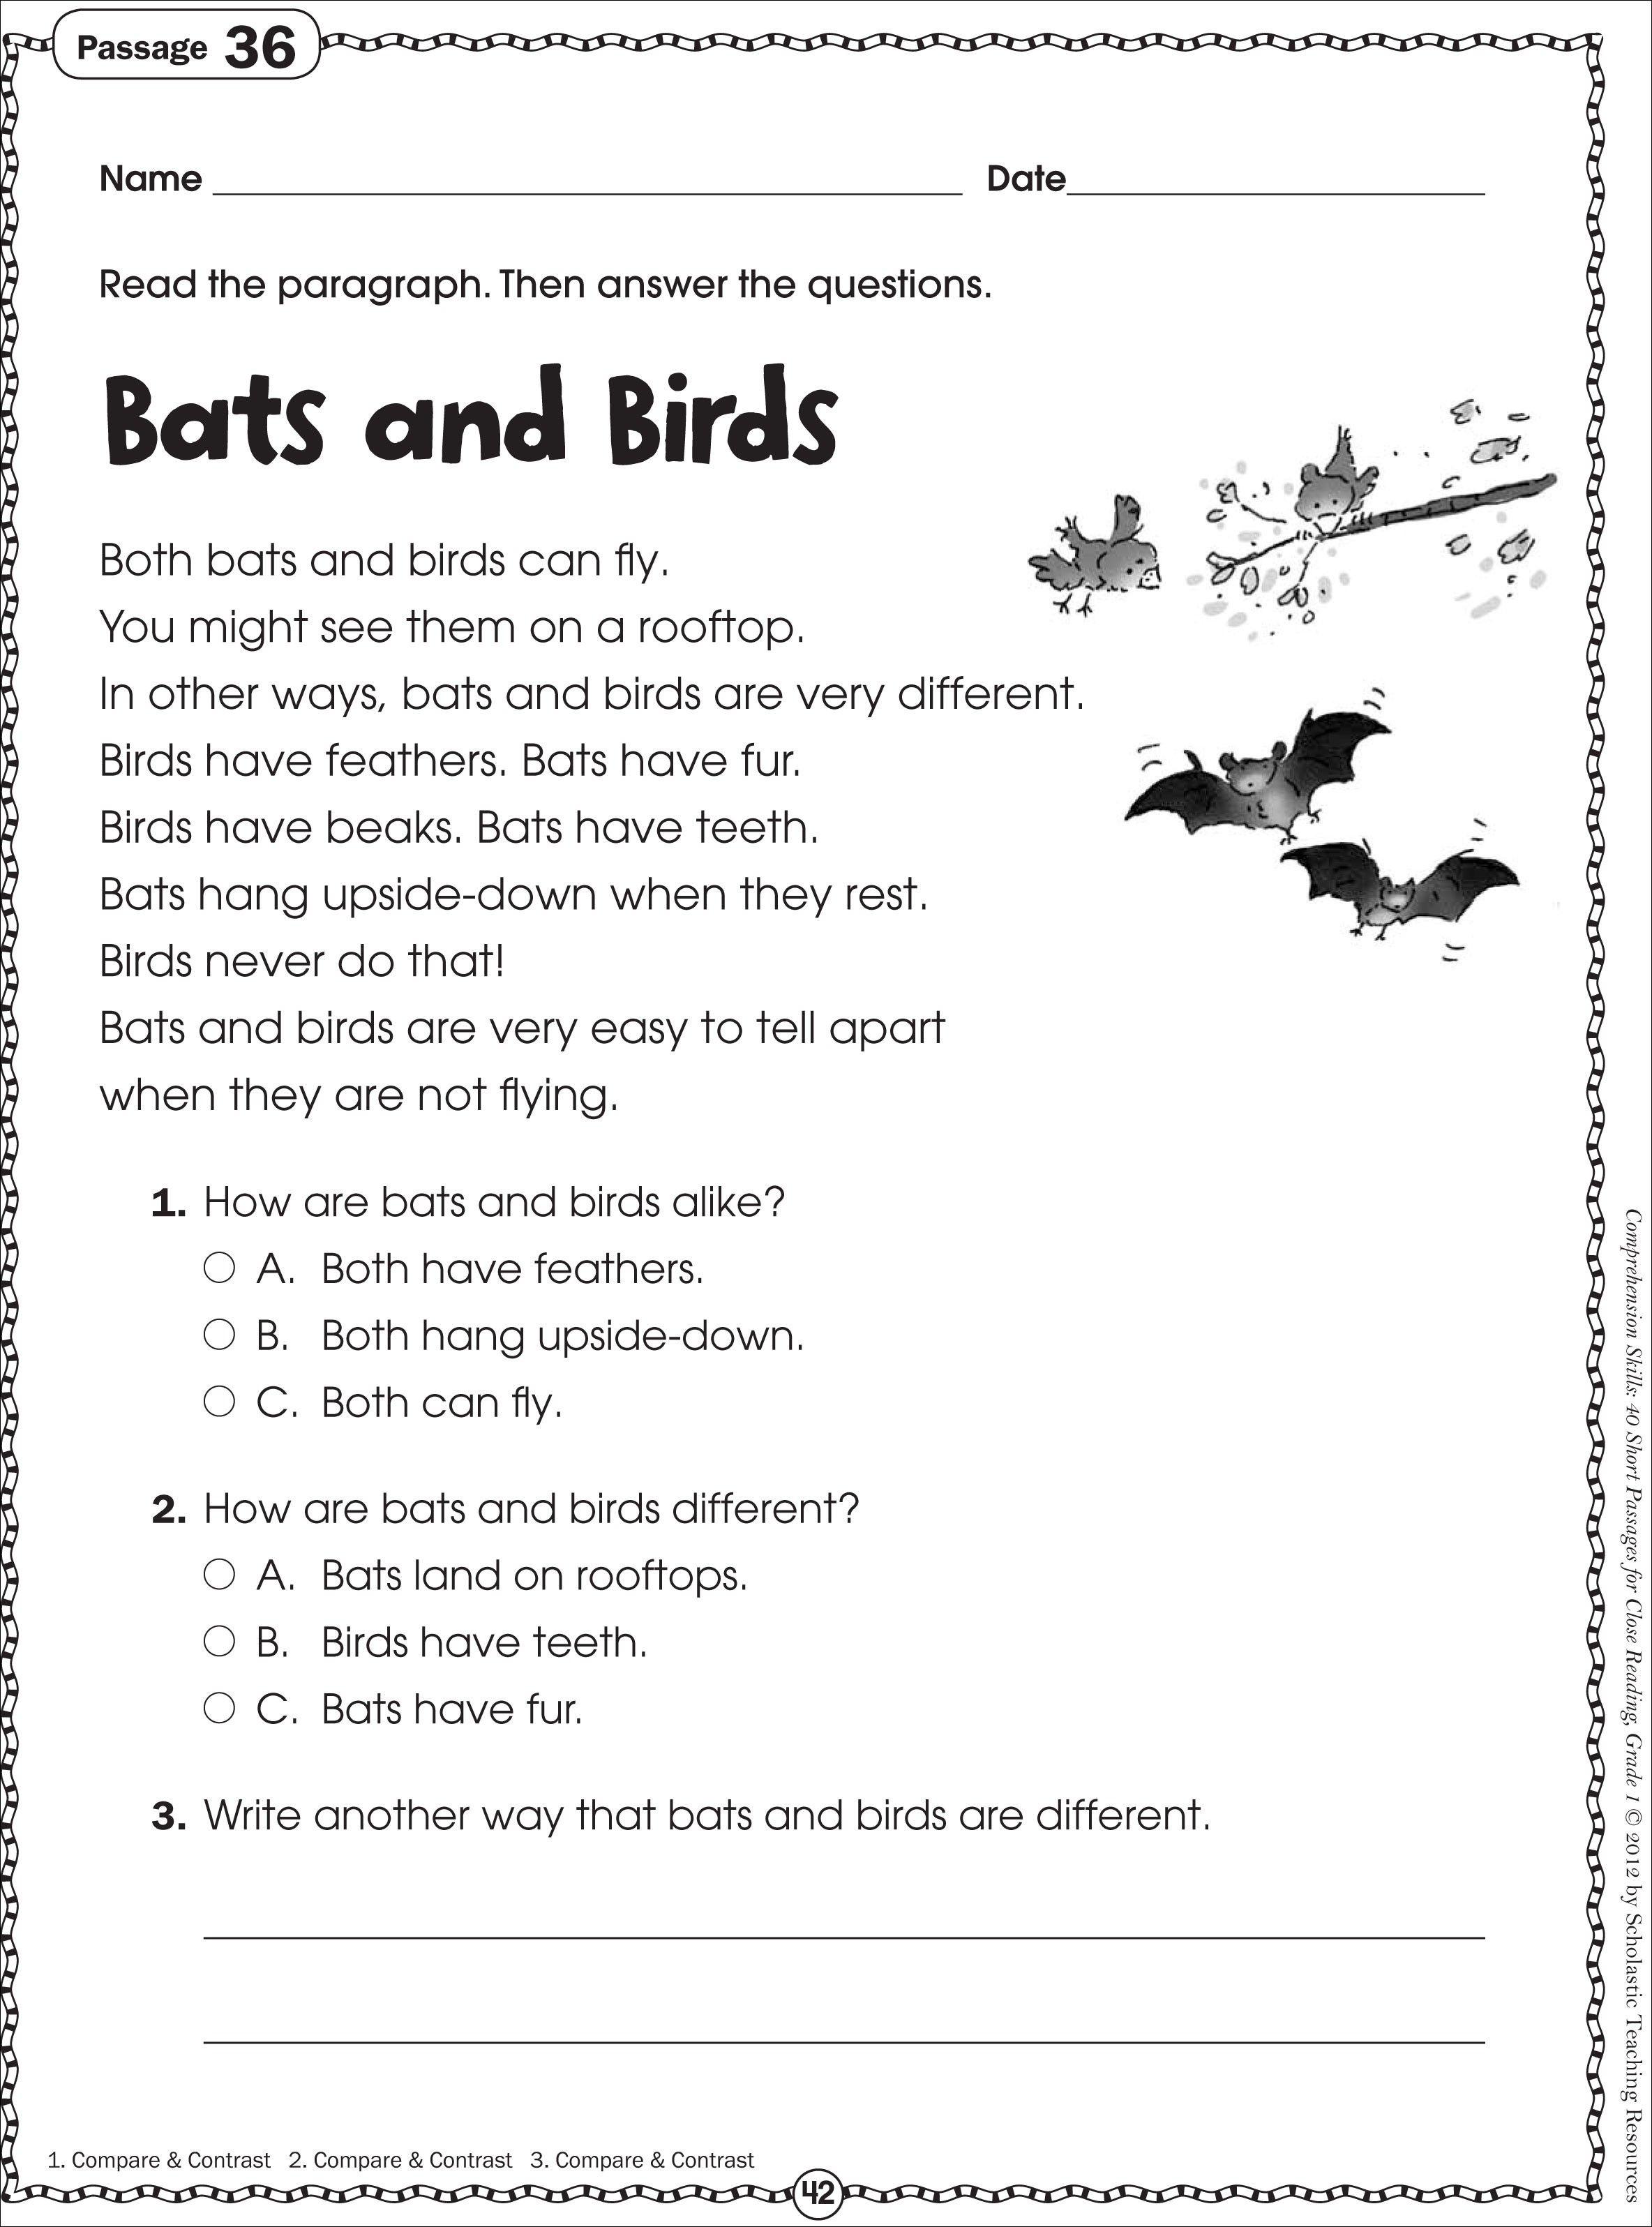 Reading Comprehension Practice Worksheet